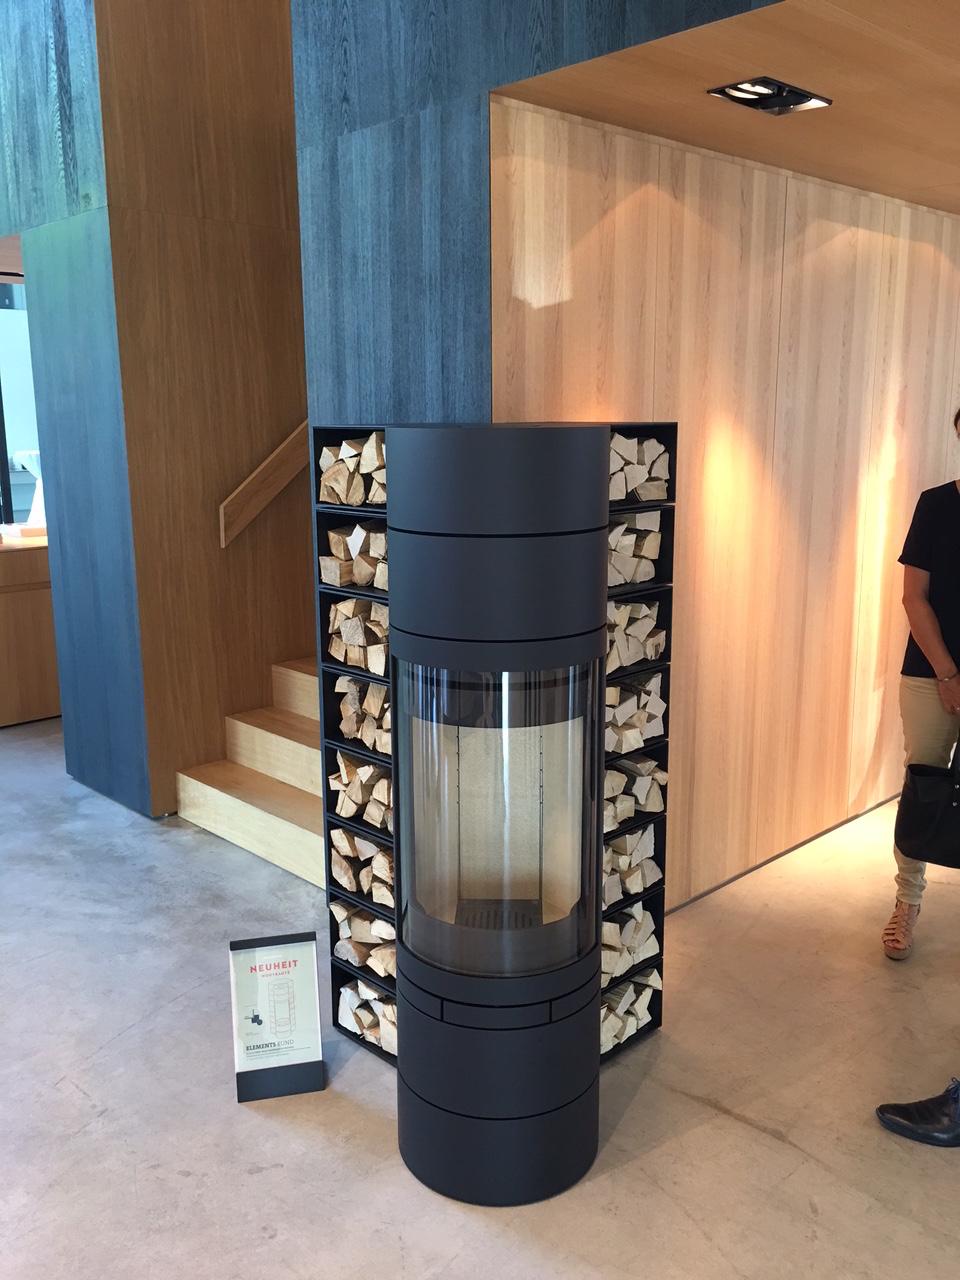 installation d 39 un po le bois marseille de marque skantherm rund elements. Black Bedroom Furniture Sets. Home Design Ideas